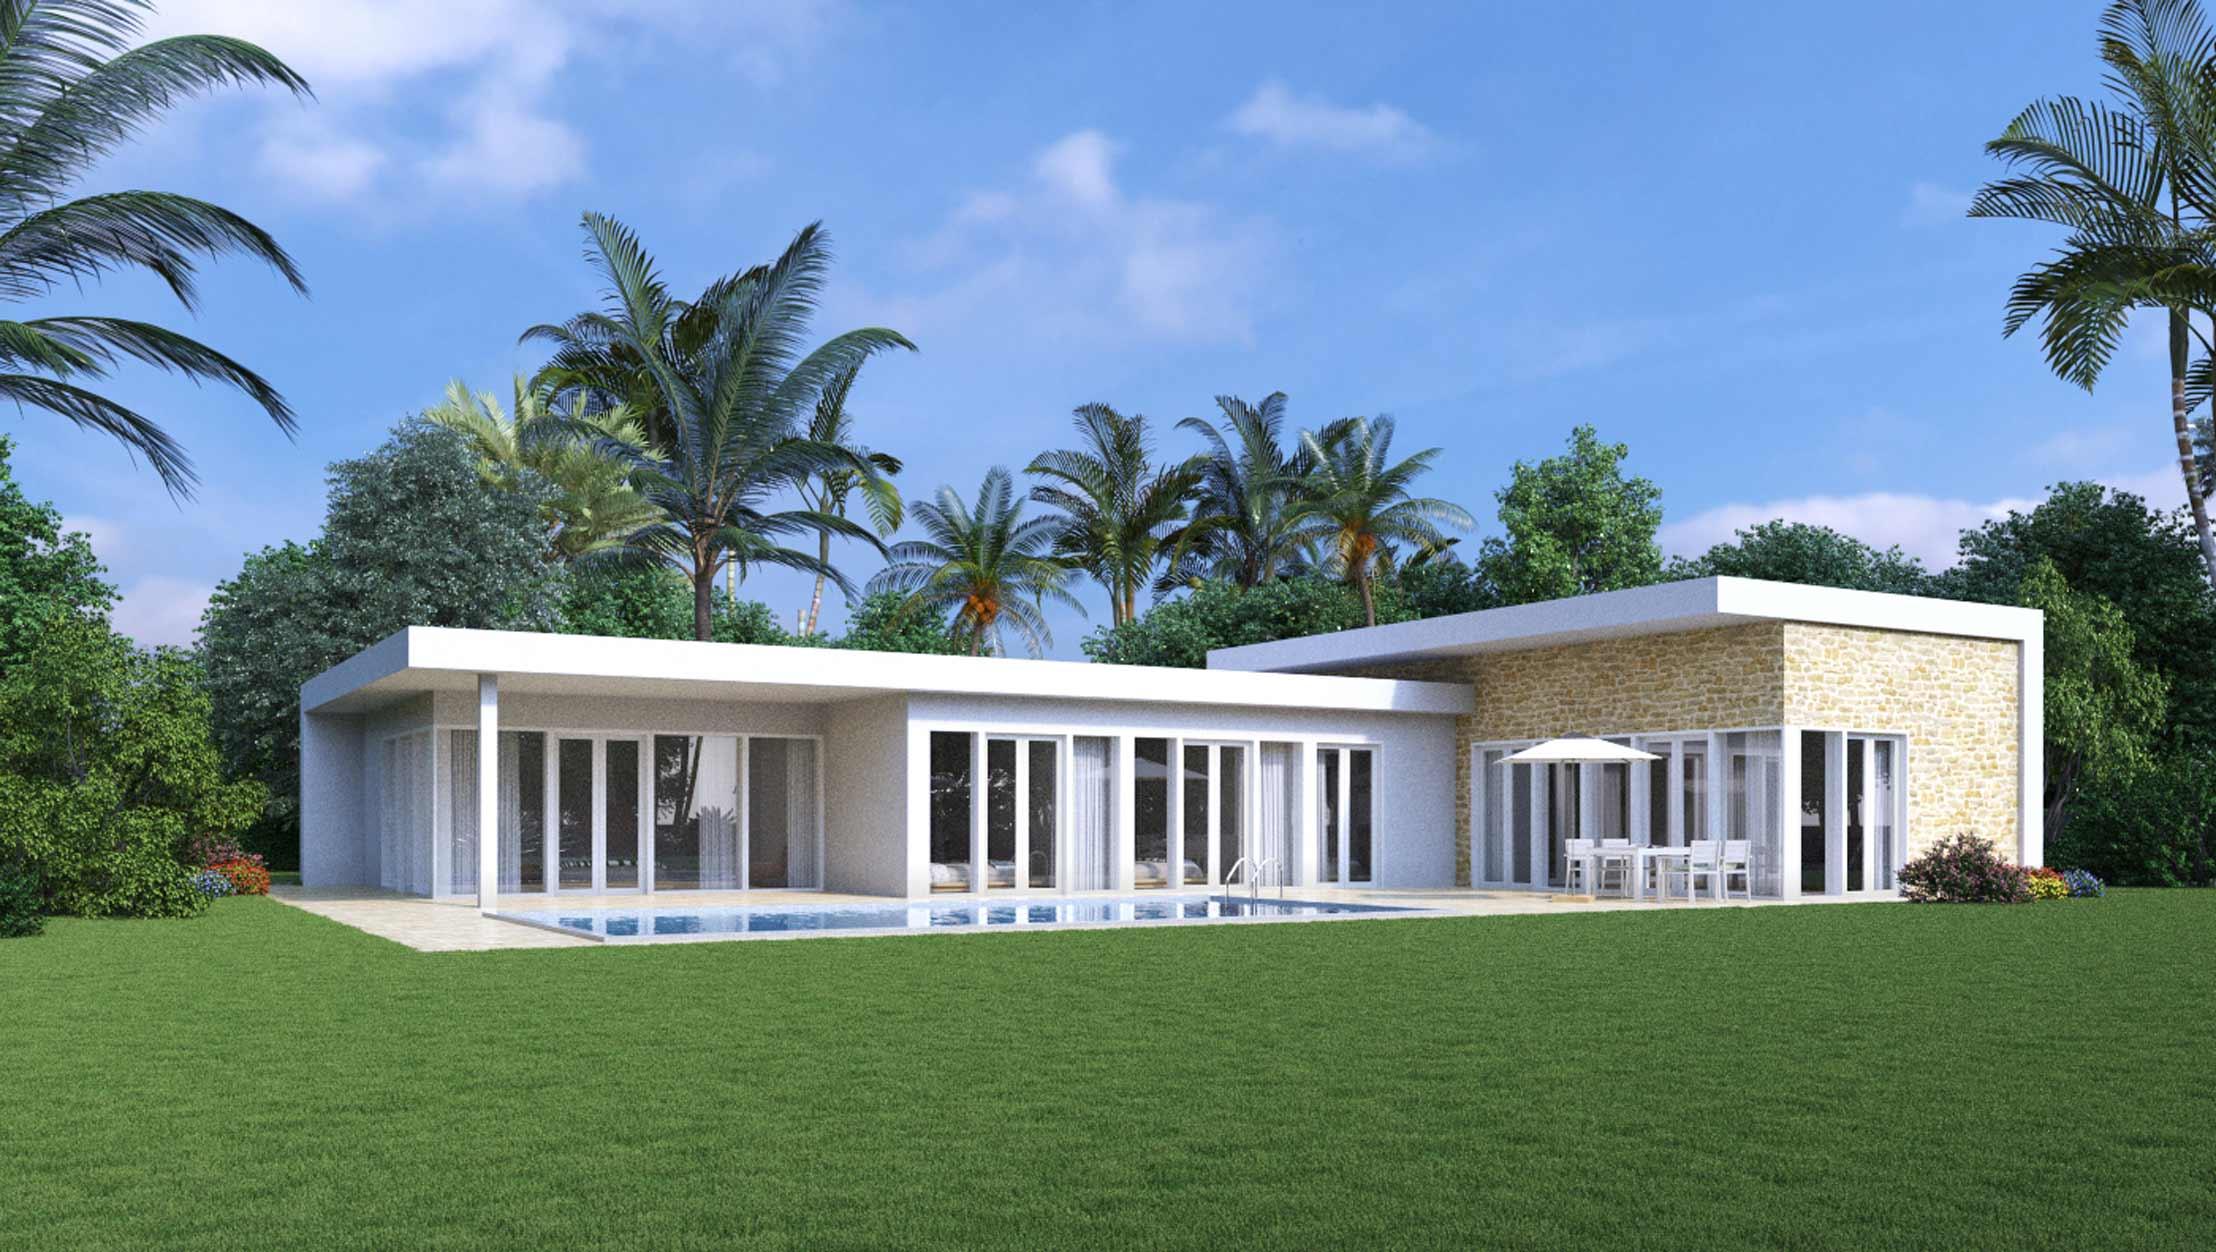 4 Bedrooms Superior Villa - Reference: SV-03